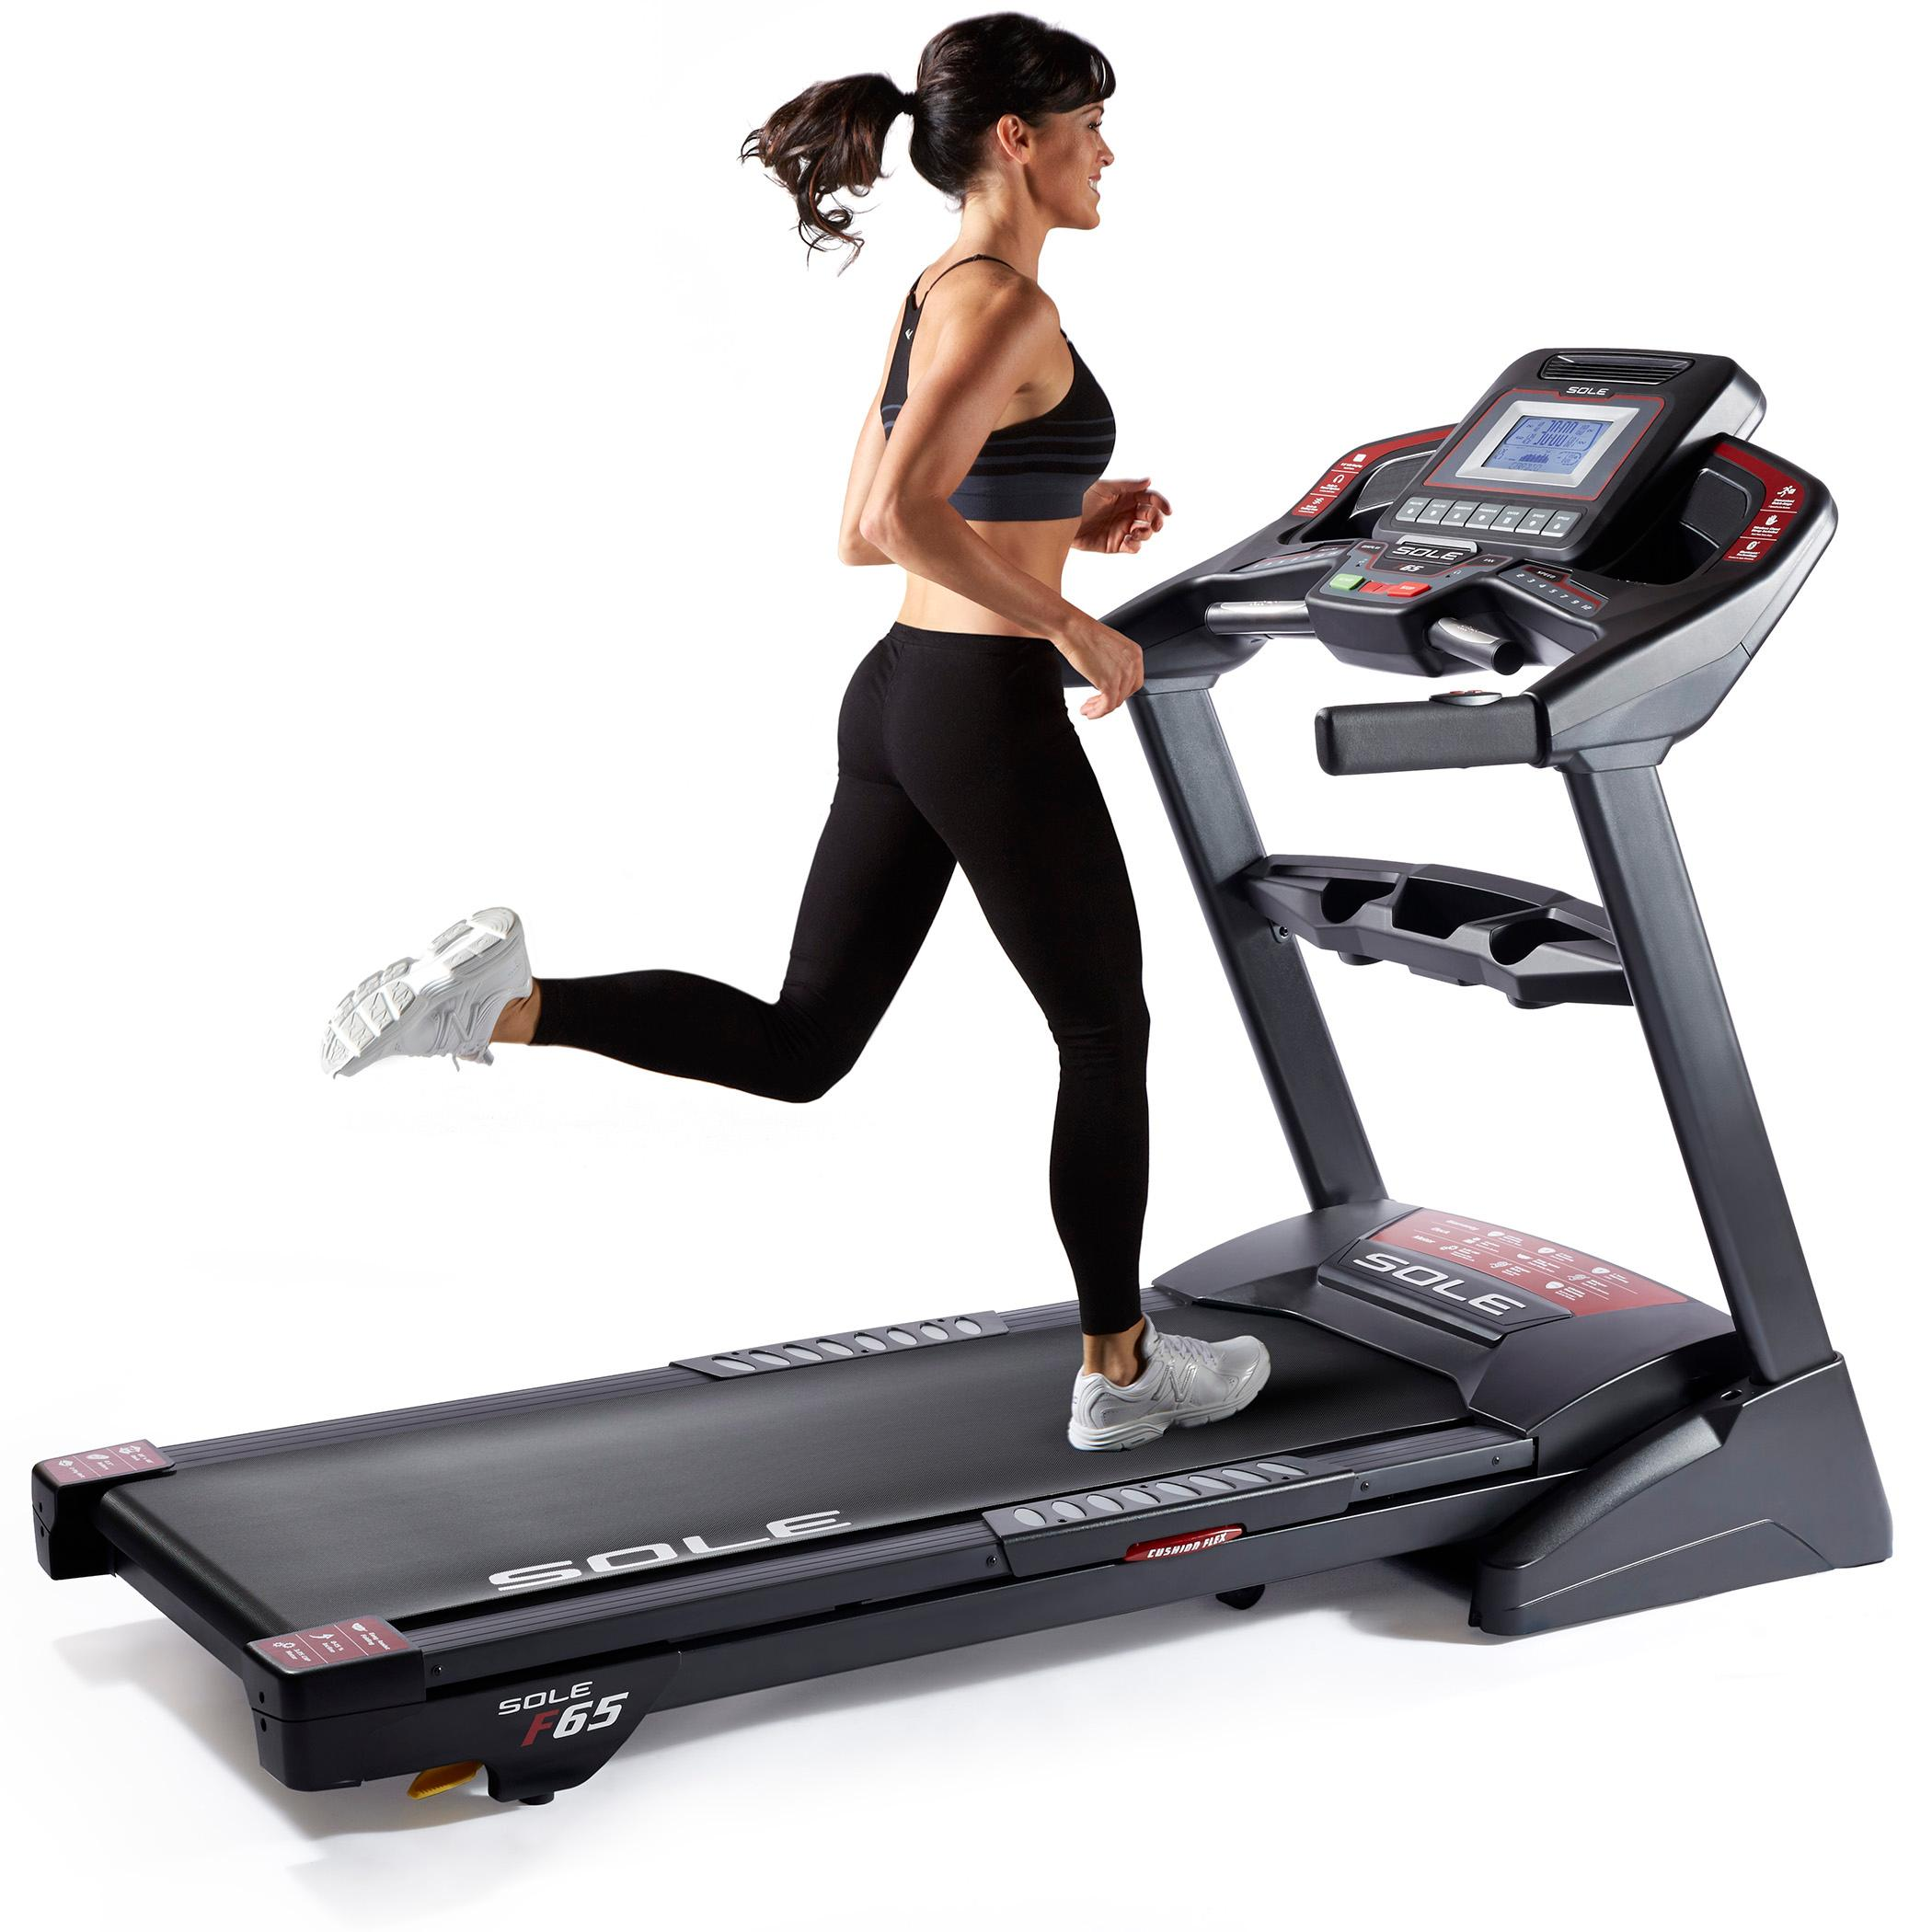 Life Fitness Treadmill Canada: SOLE Fitness F65 Folding Treadmill Machine